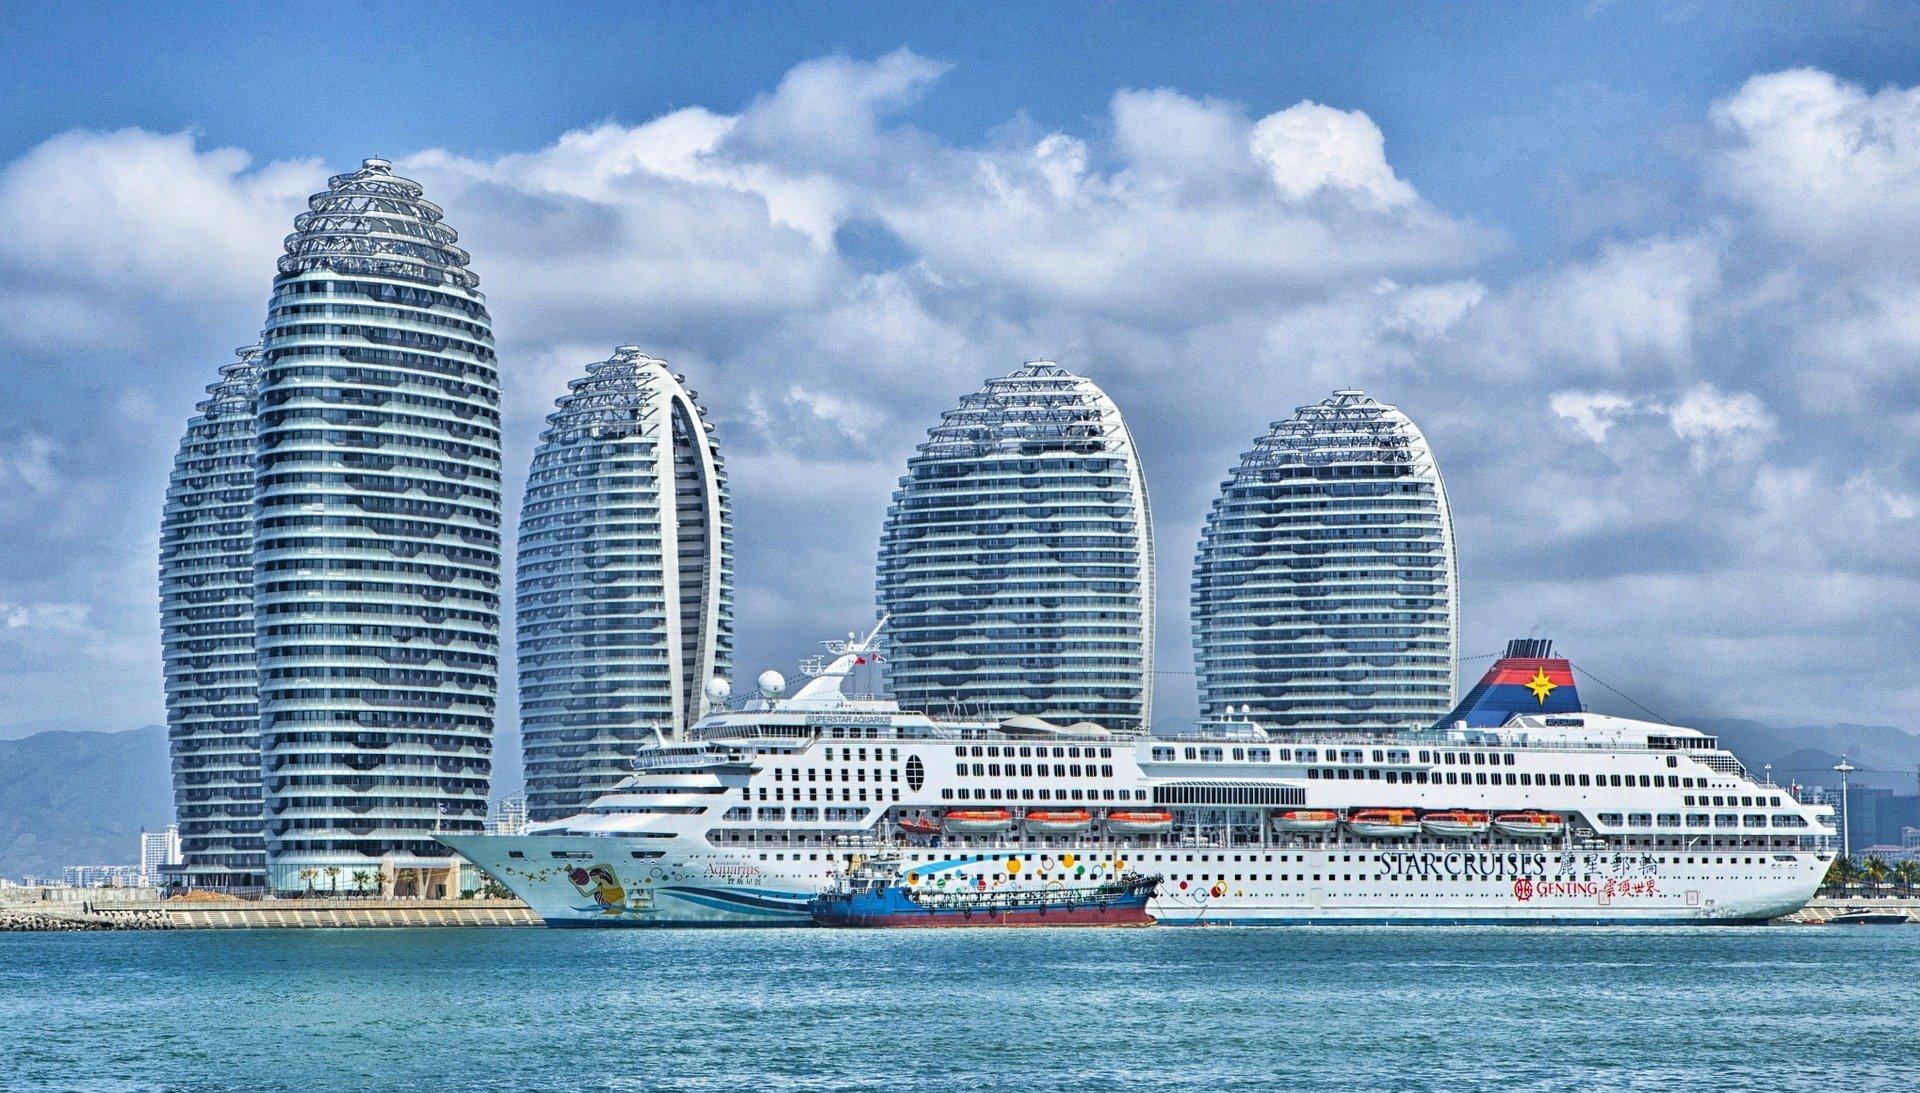 Hainan skyscrapers ans ship